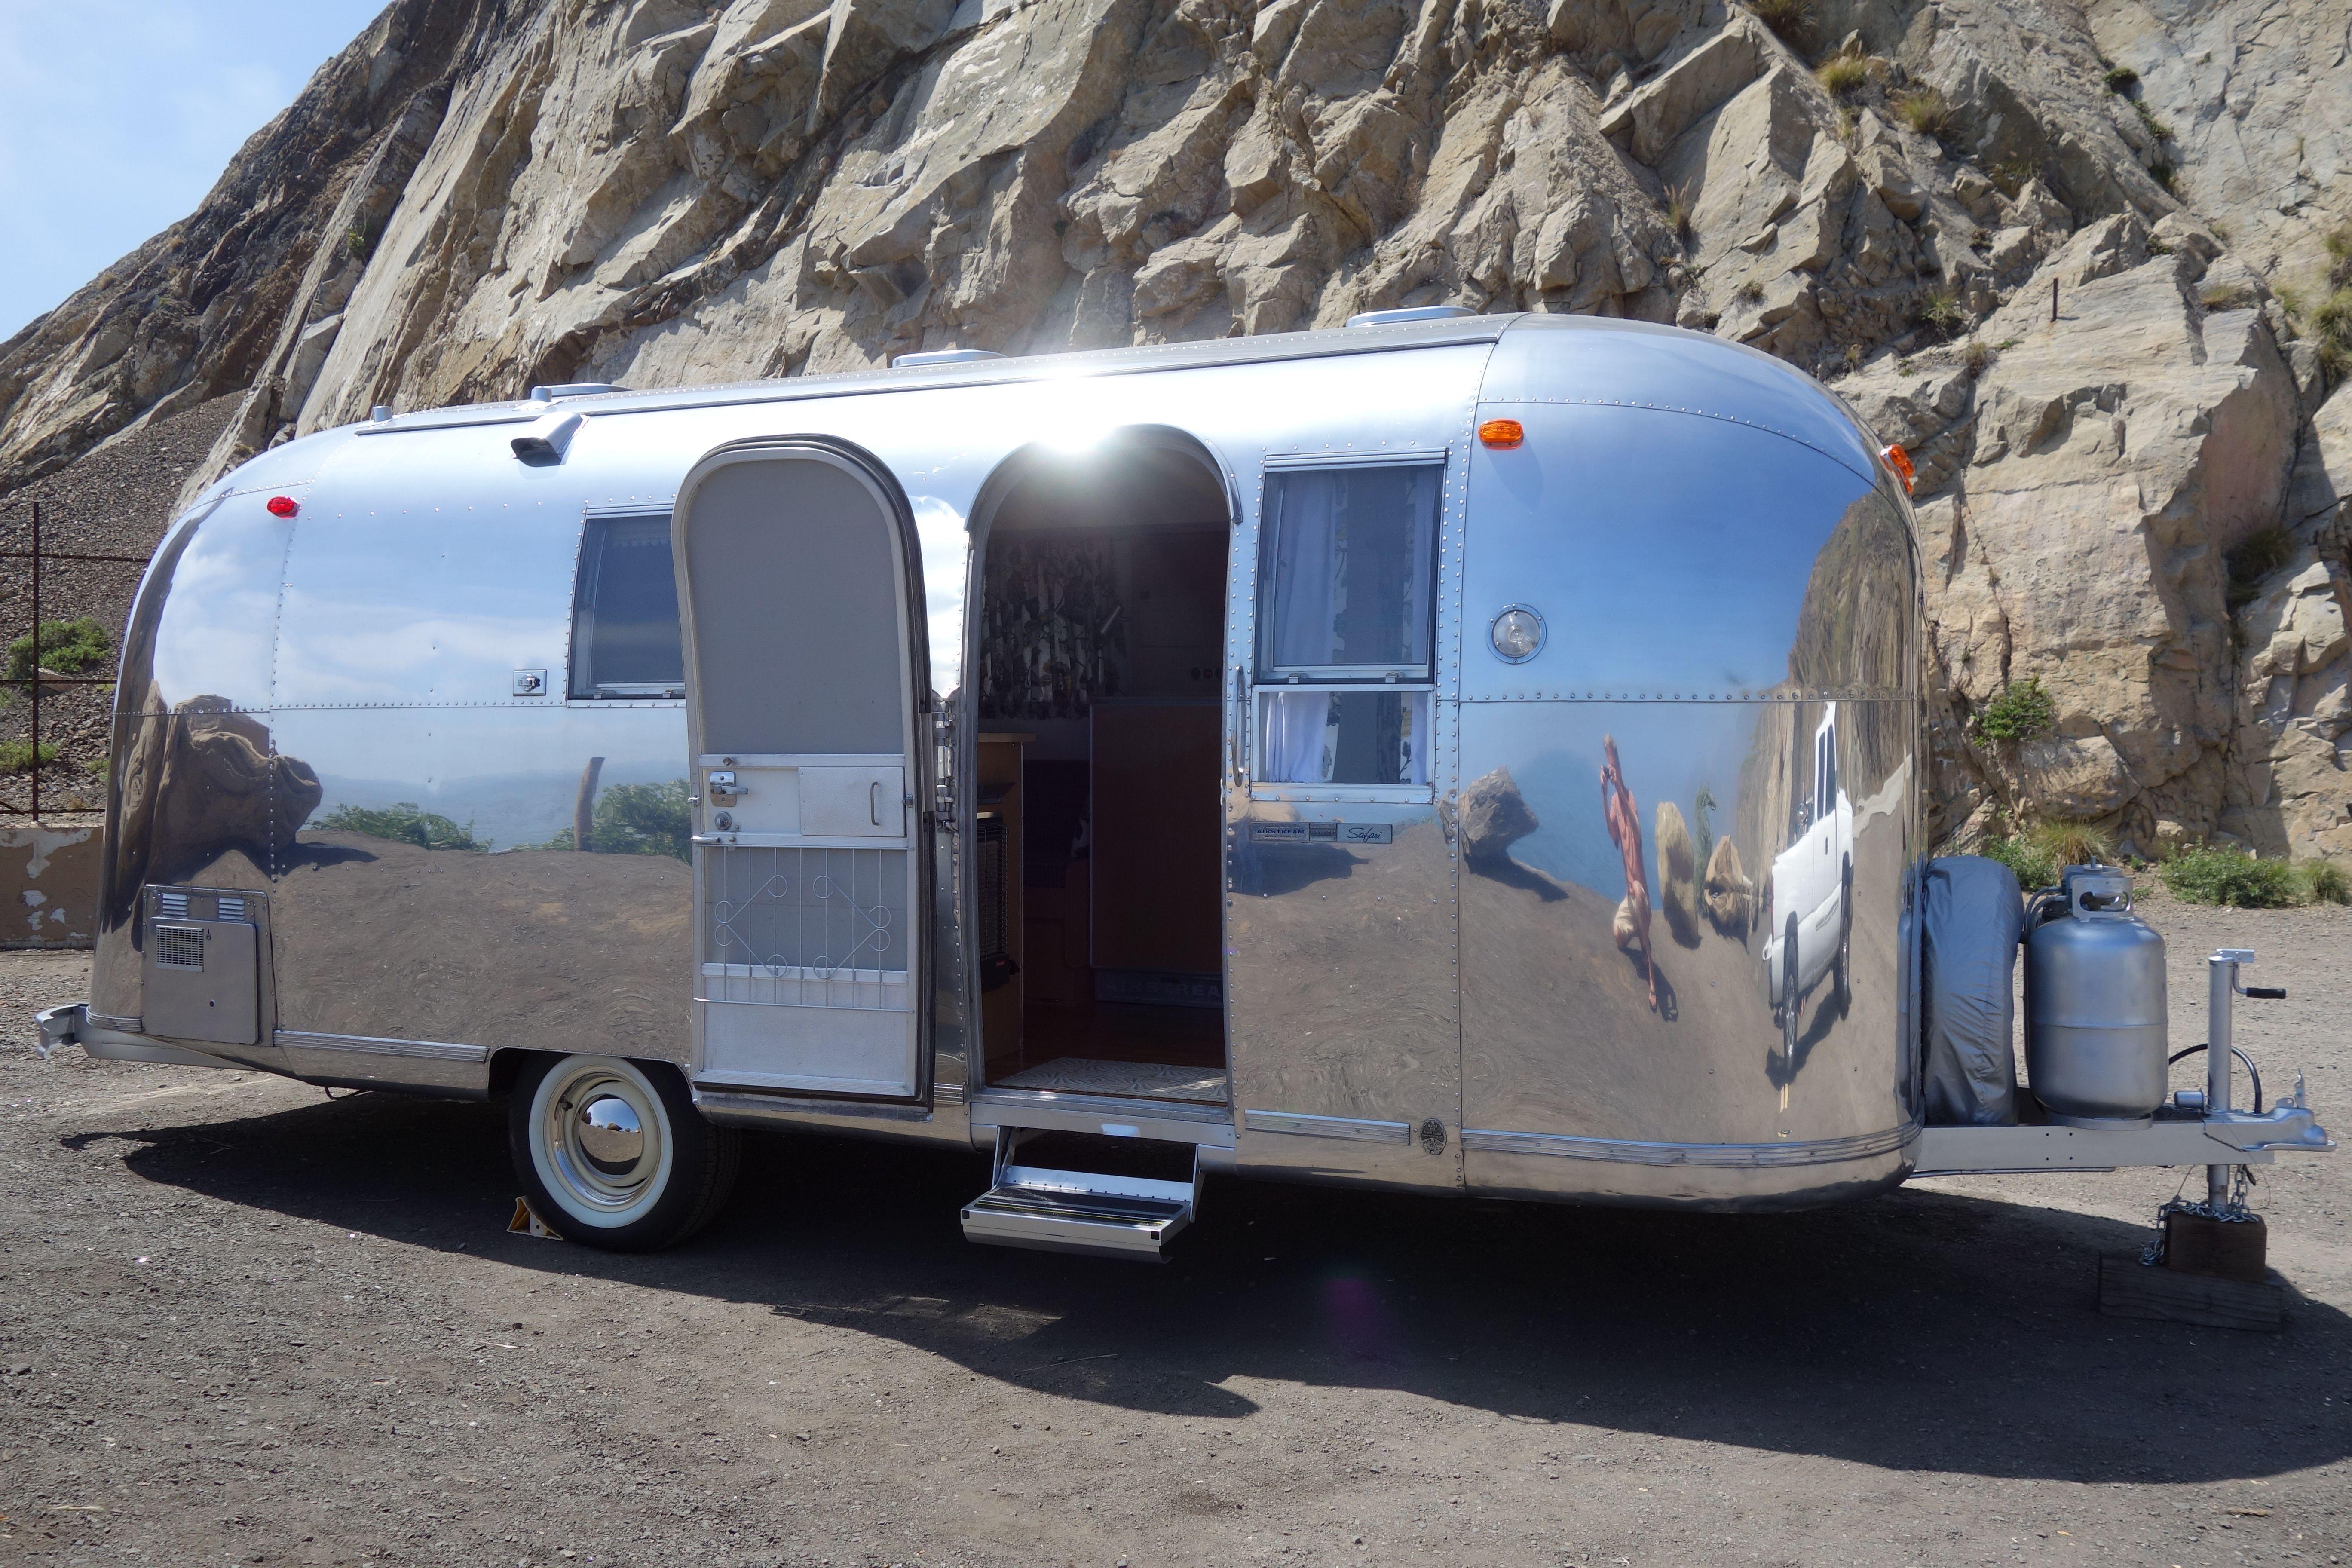 1967 Airstream Safari We Buy Vintage Airstreams Briangs11 Gmail Com Vintage Travel Trailers Camper Caravan Recreational Vehicles